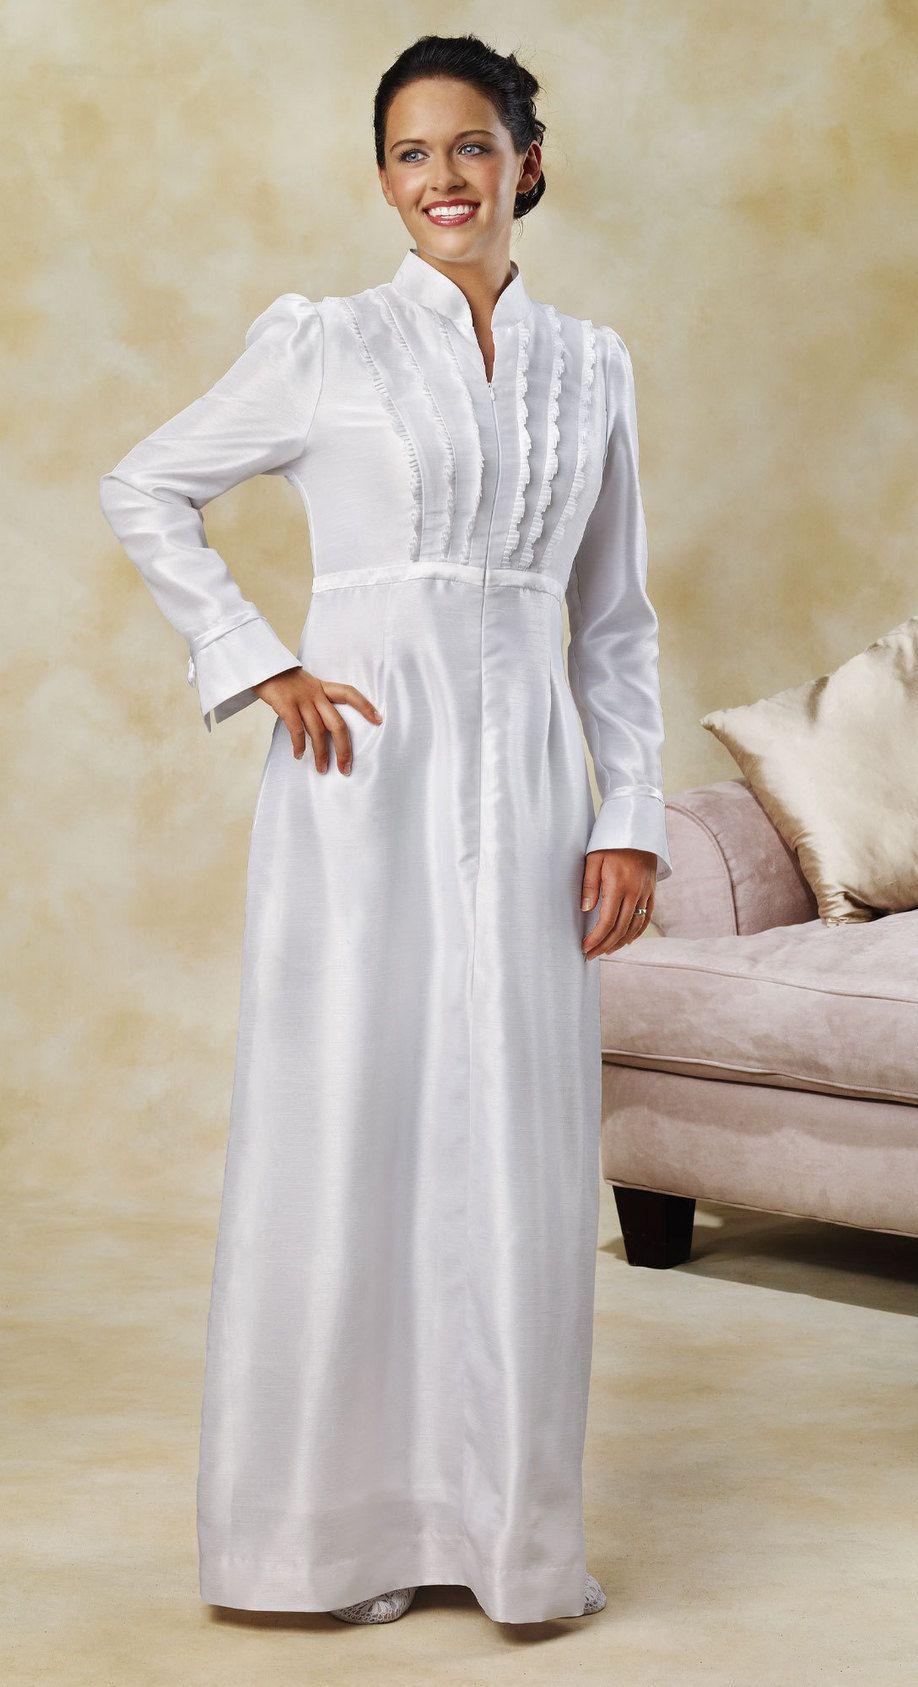 White Lds Temple Dresses - Jill Dress